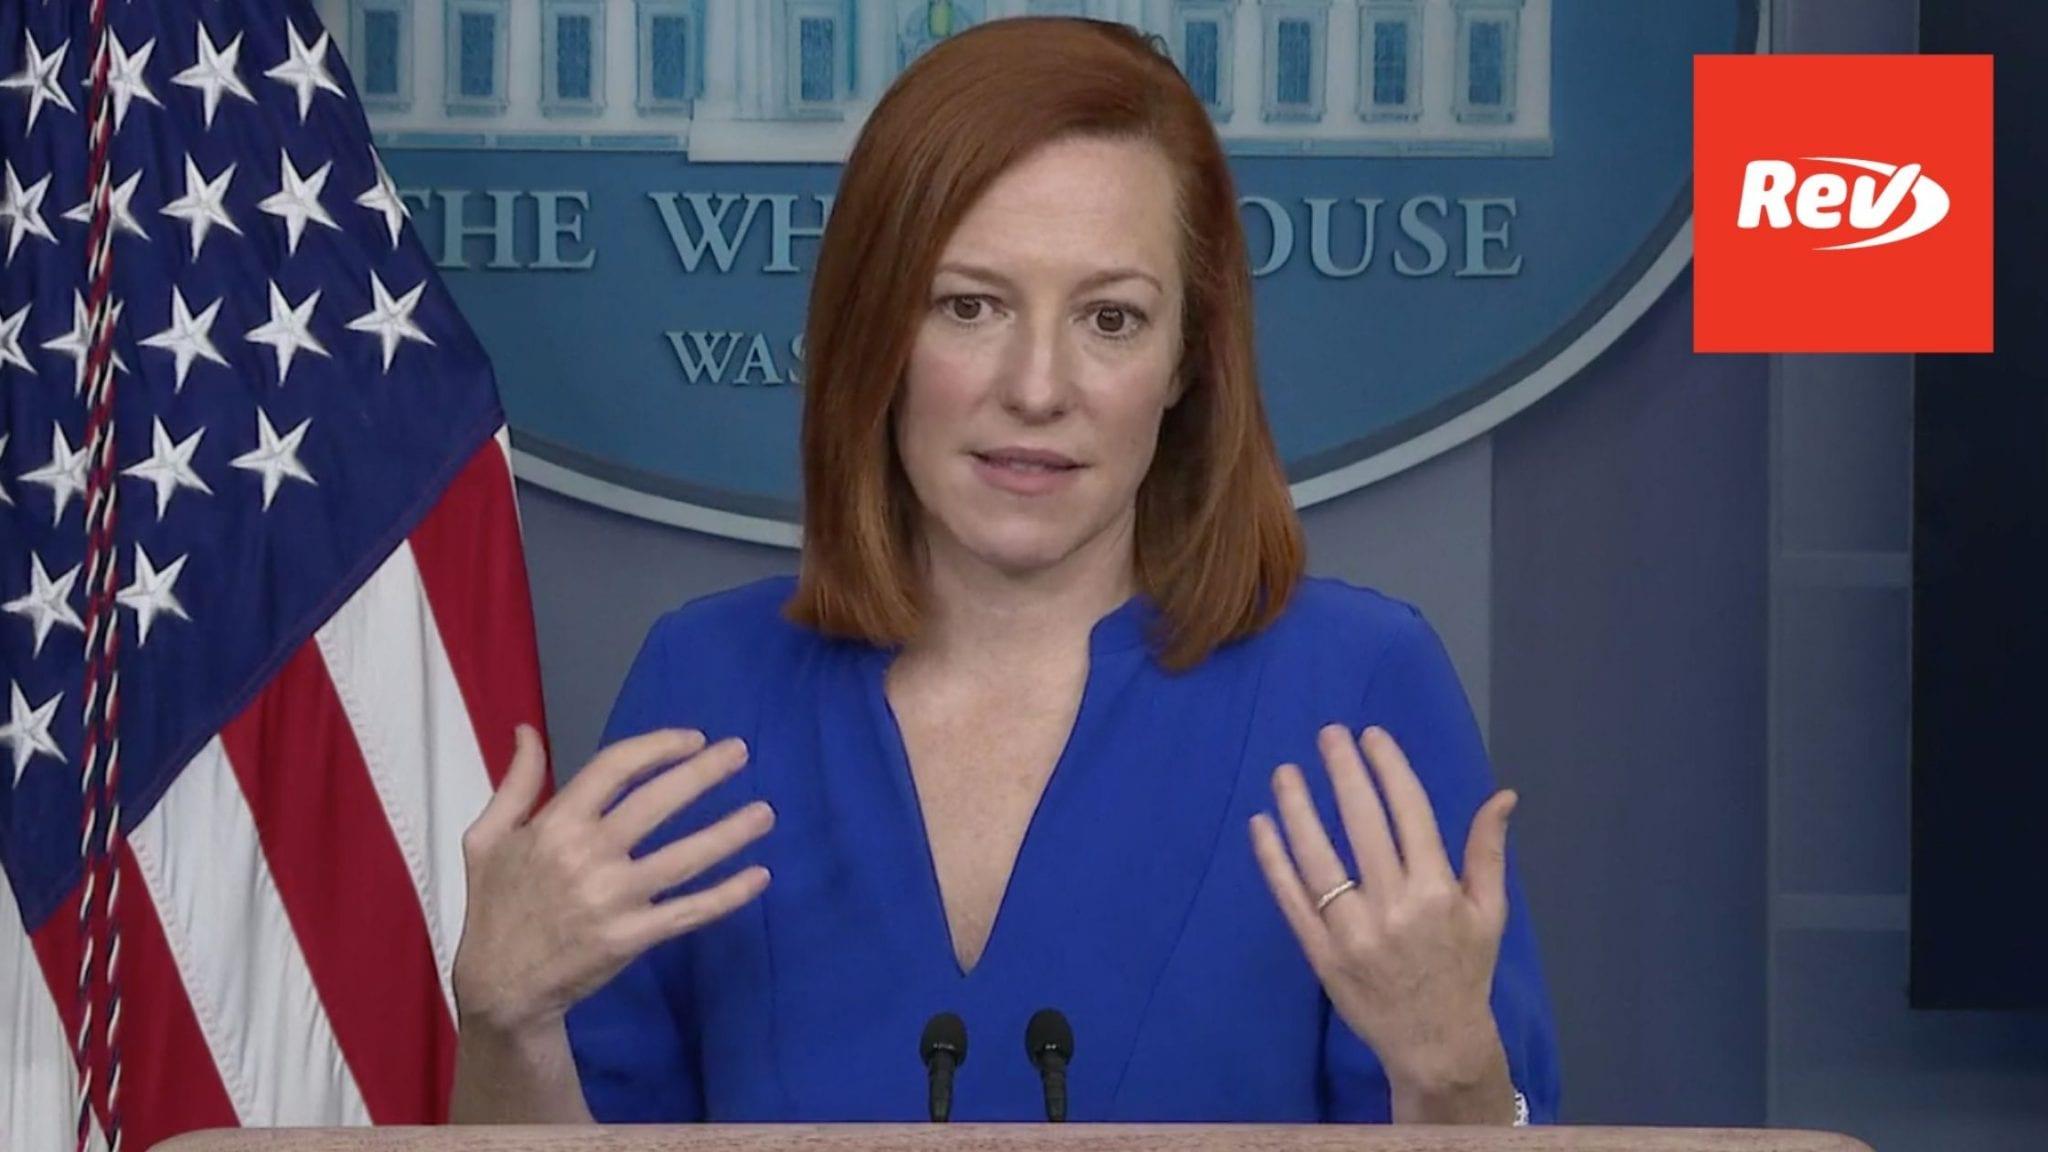 Press Secretary Jen Psaki White House Press Conference Transcript March 12